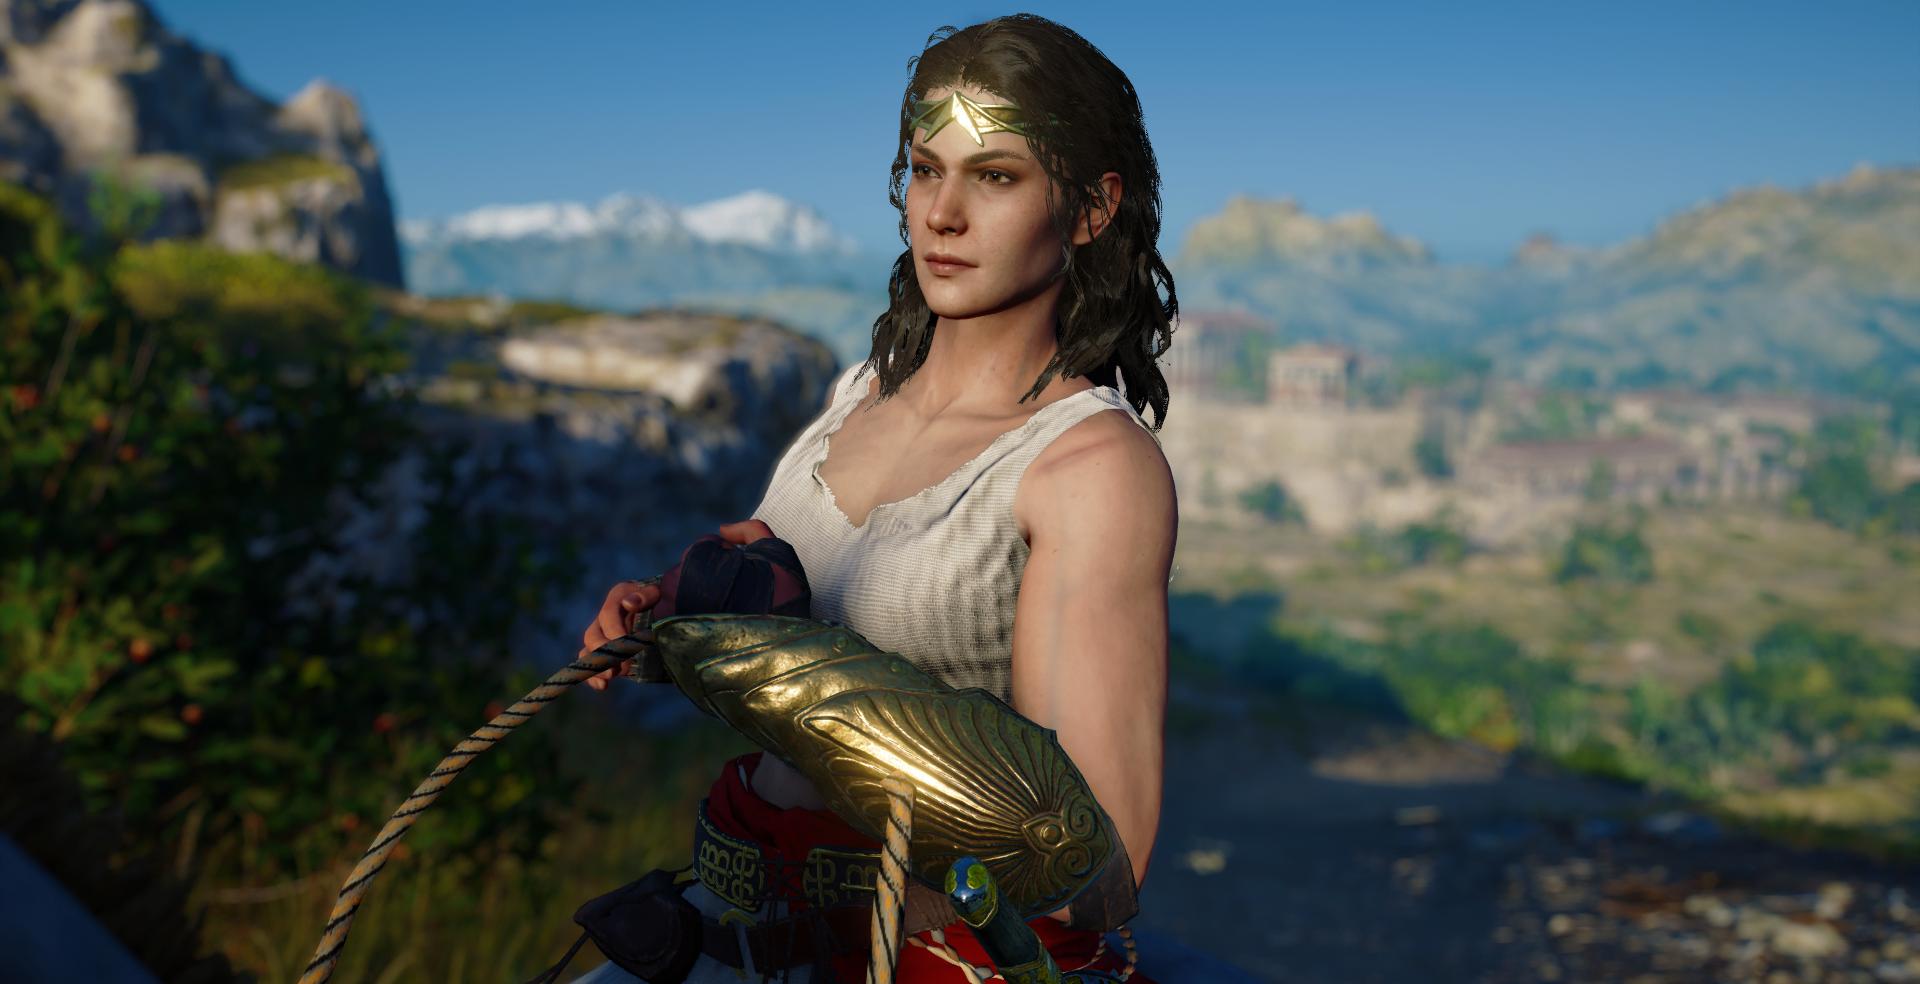 Black Kassandra Mod - Assassins Creed Odyssey Mods